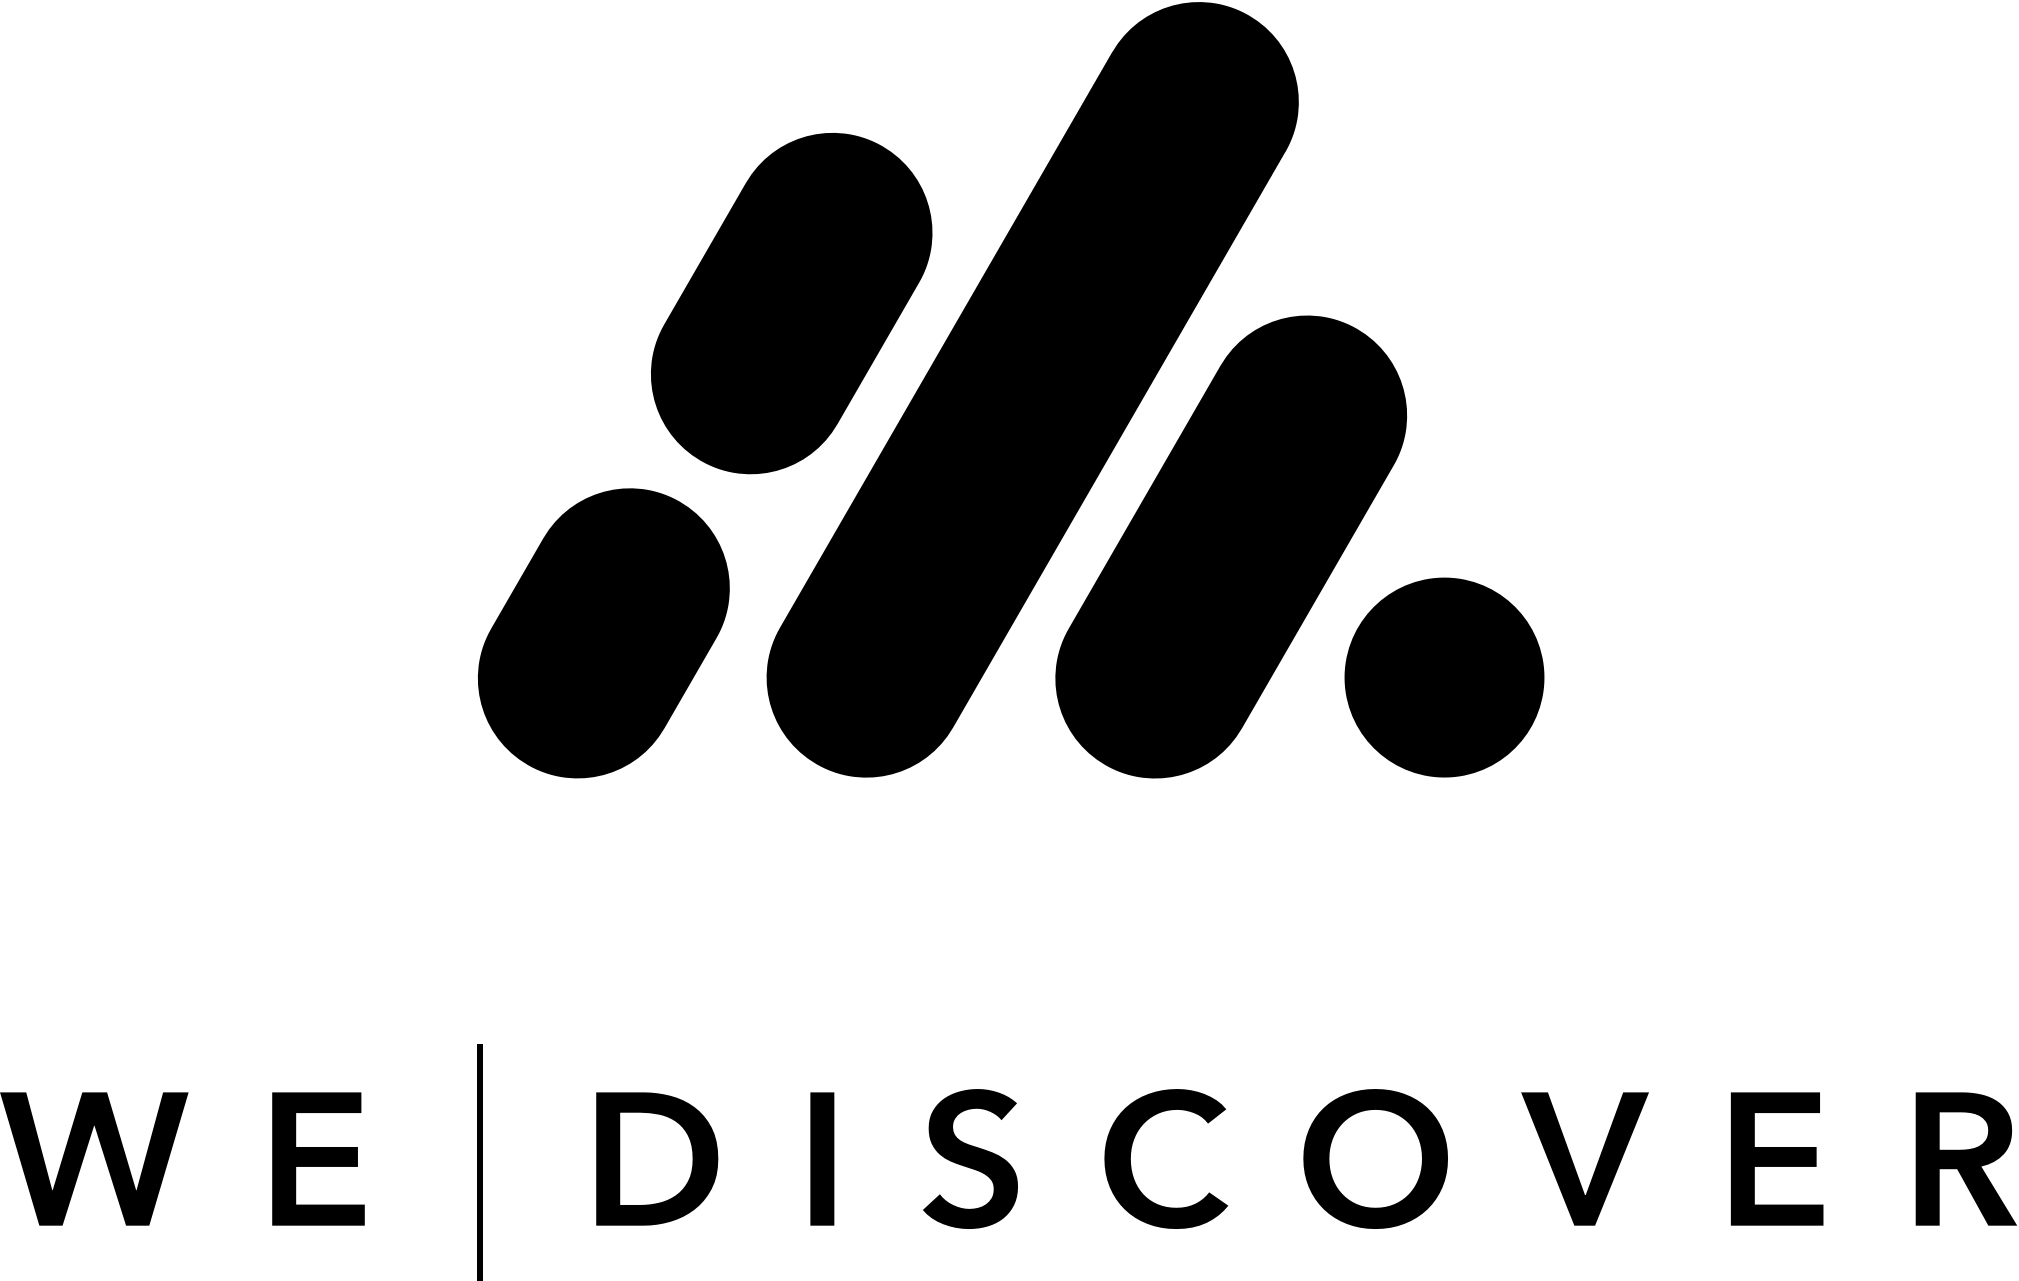 Wediscover logo